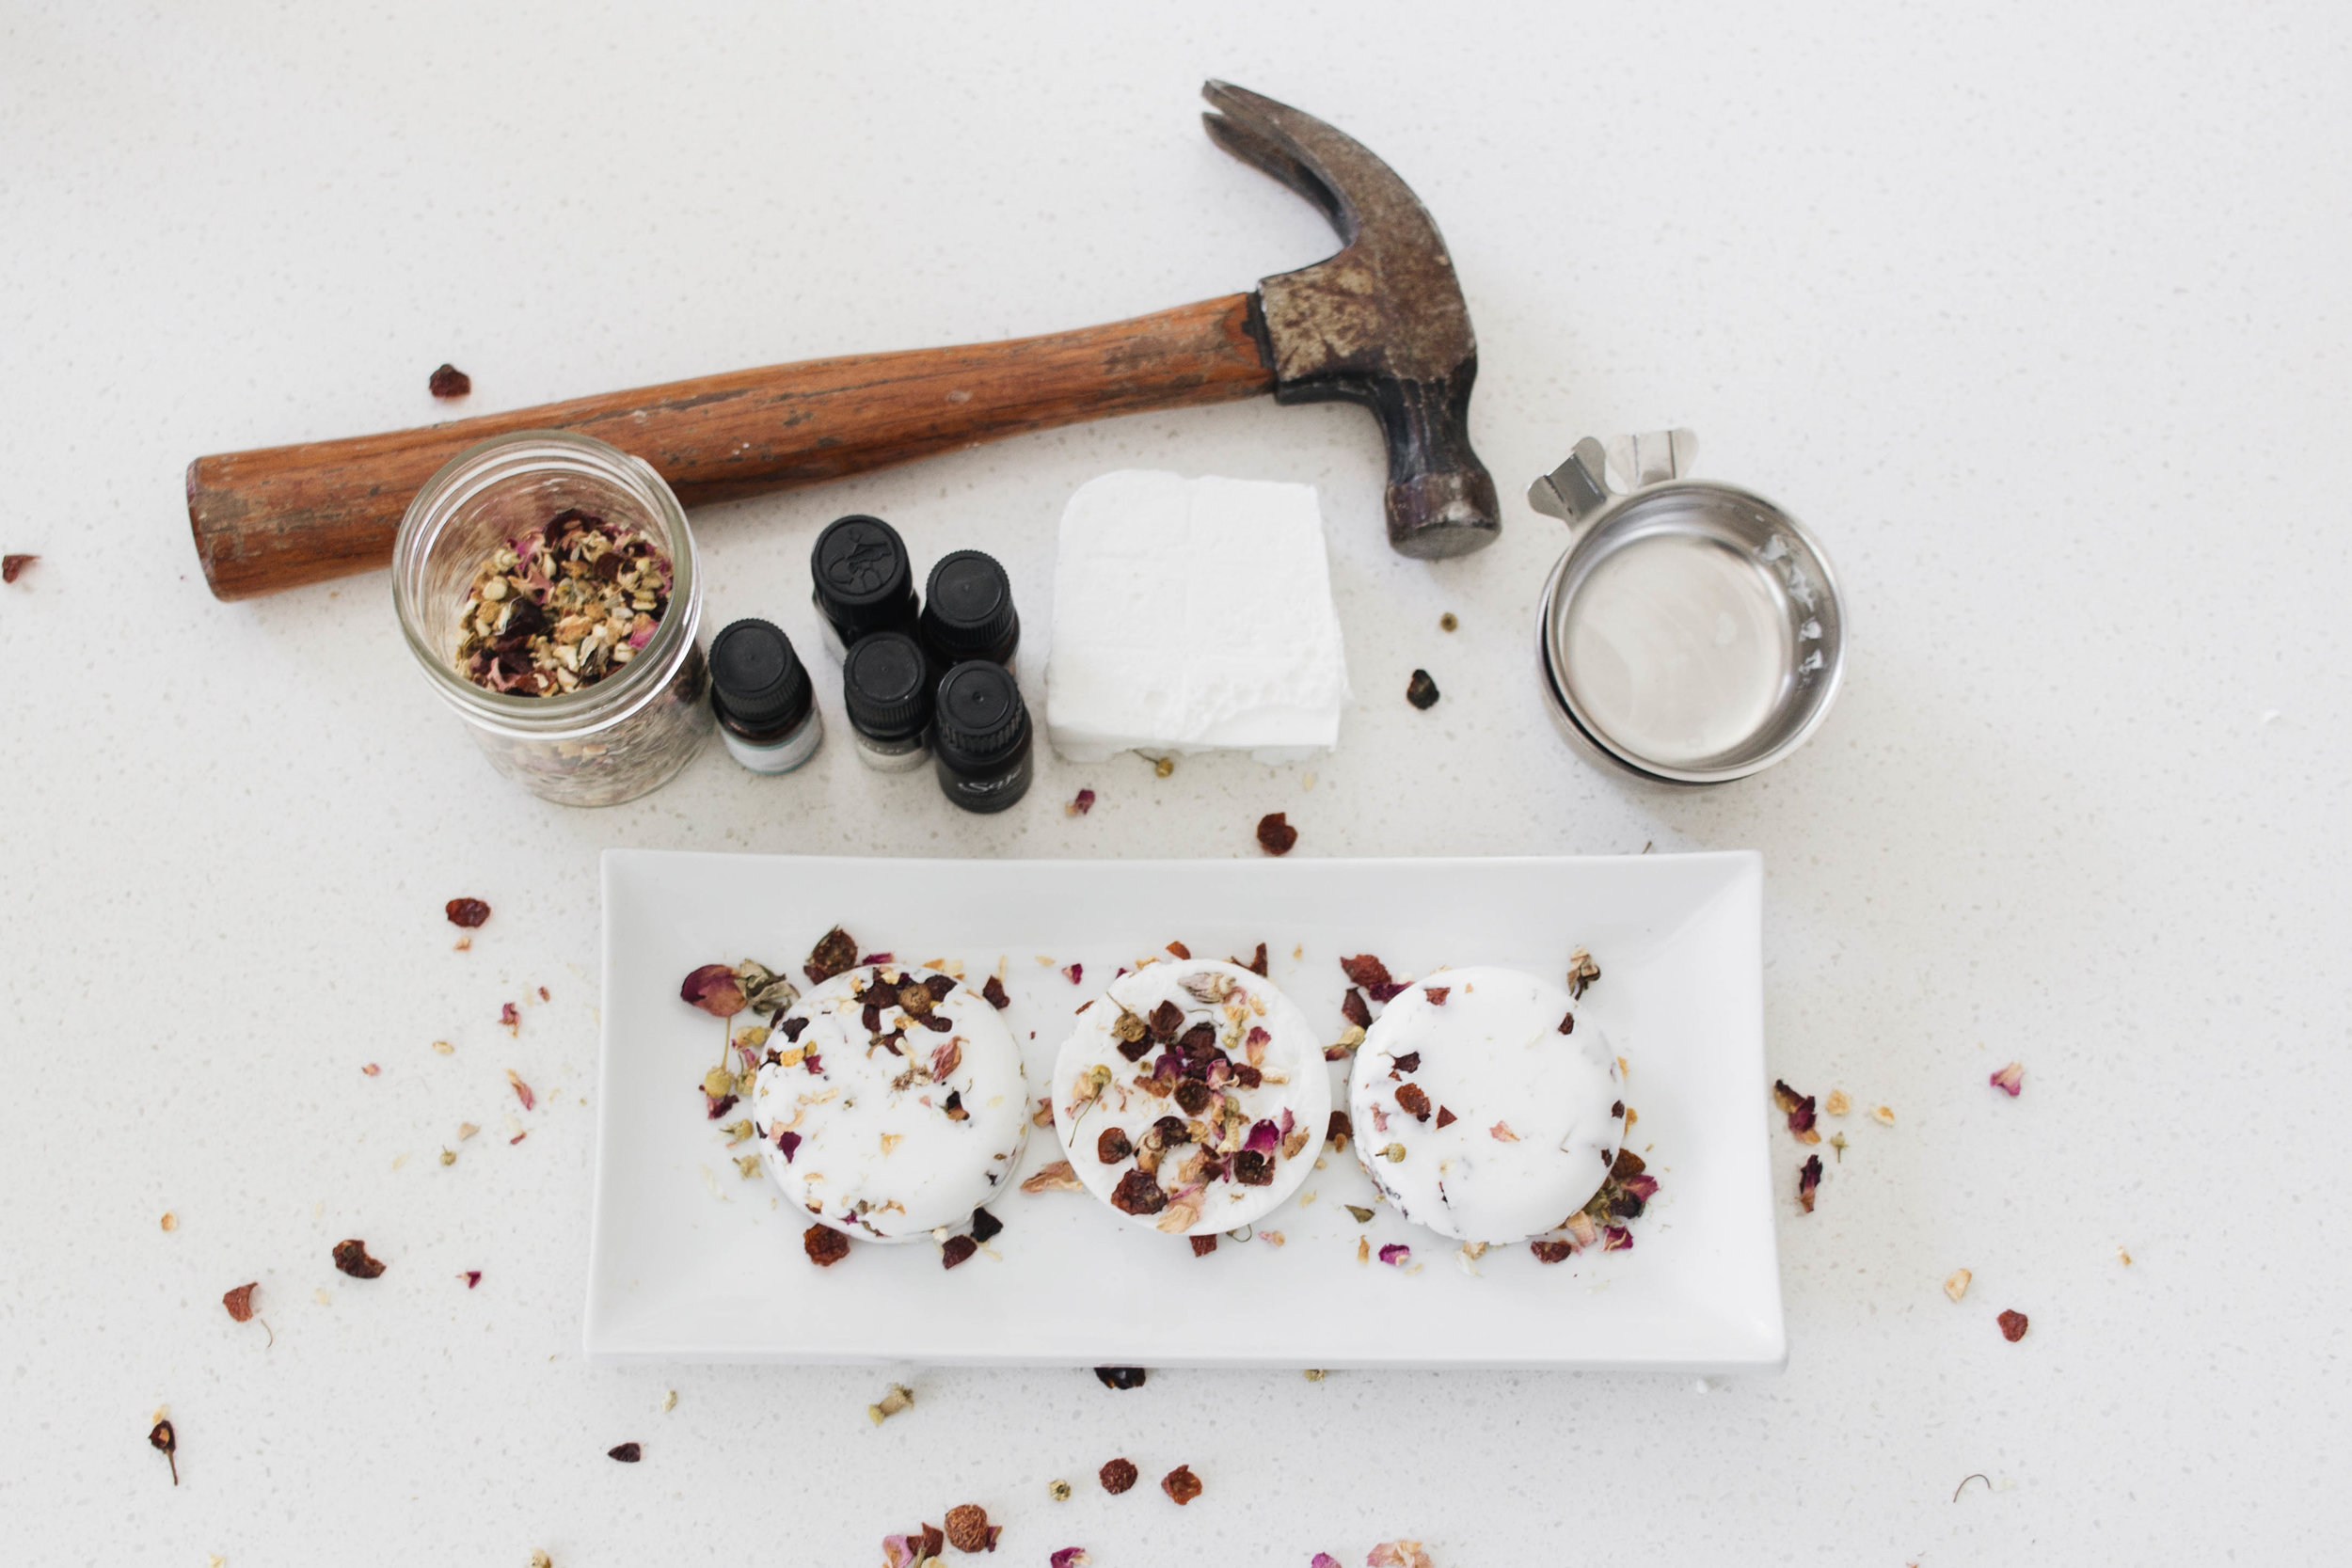 diy-soap-with-essential-oils-dried-flowers-1.jpg